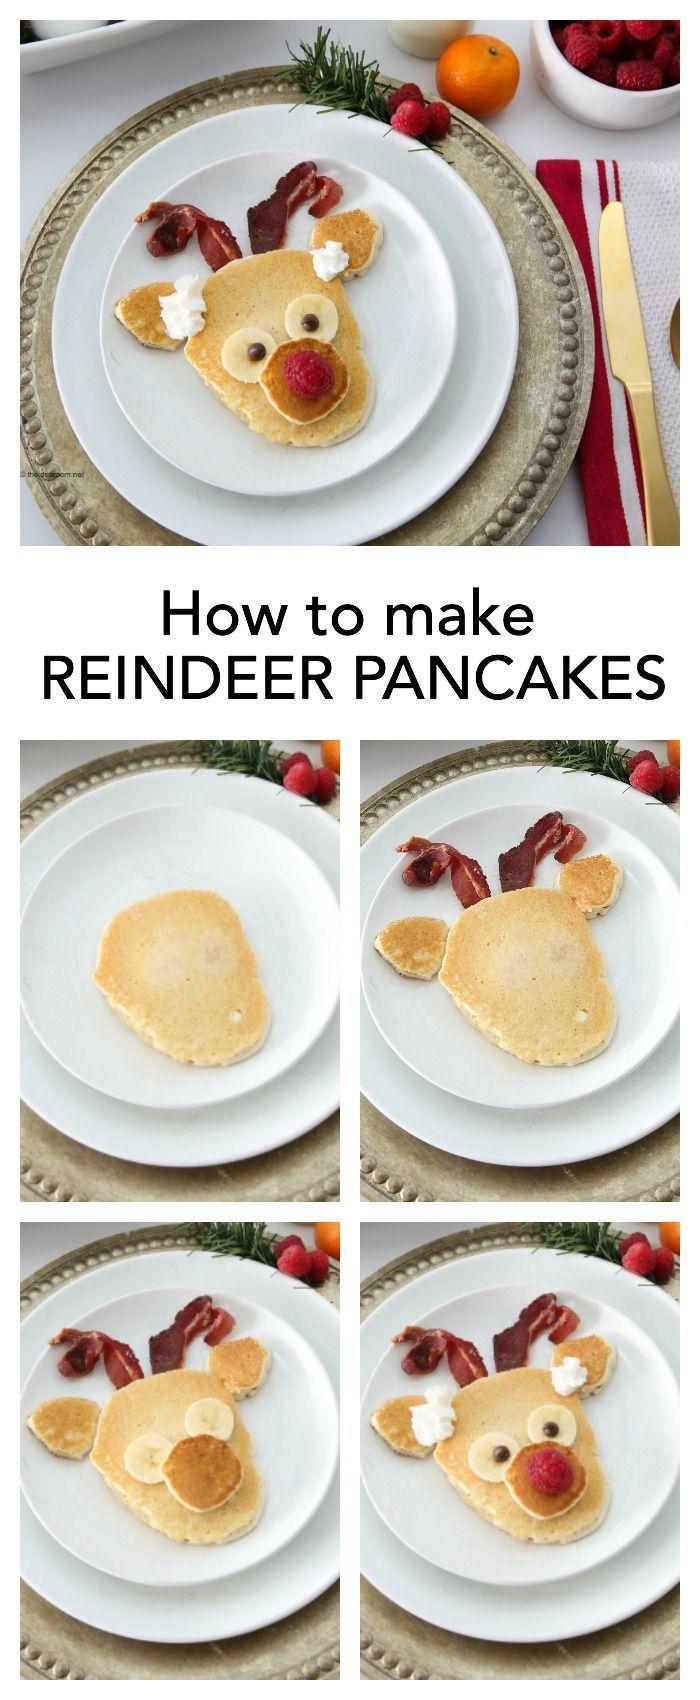 629 best food • breakfast images on Pinterest | Cooking food, Baking ...